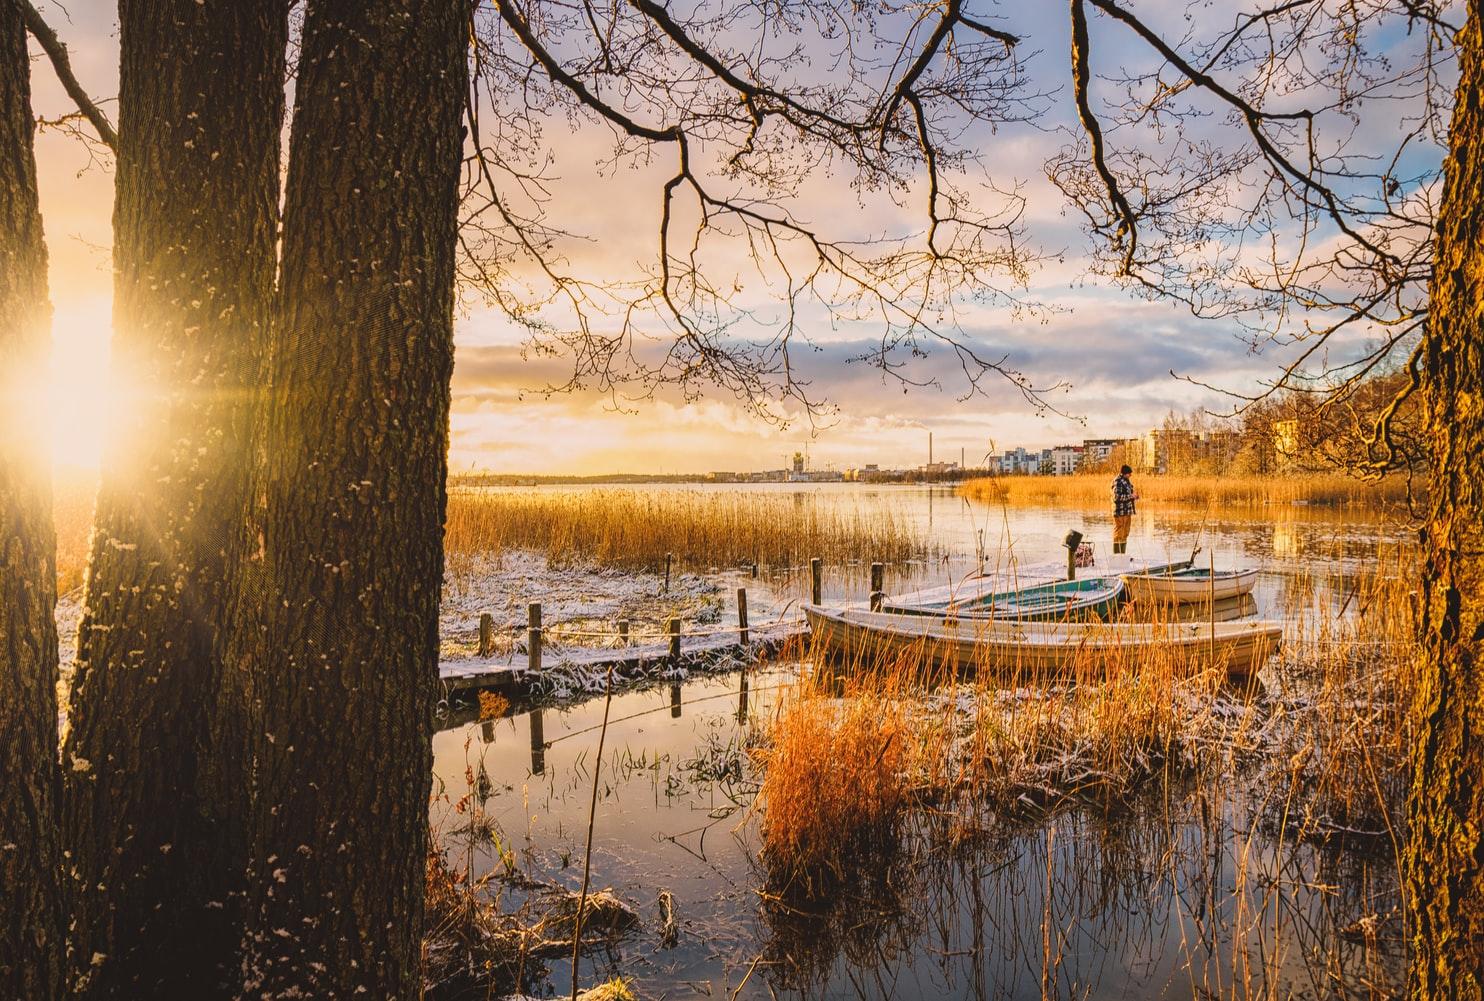 estudar-na-finlandia-natureza